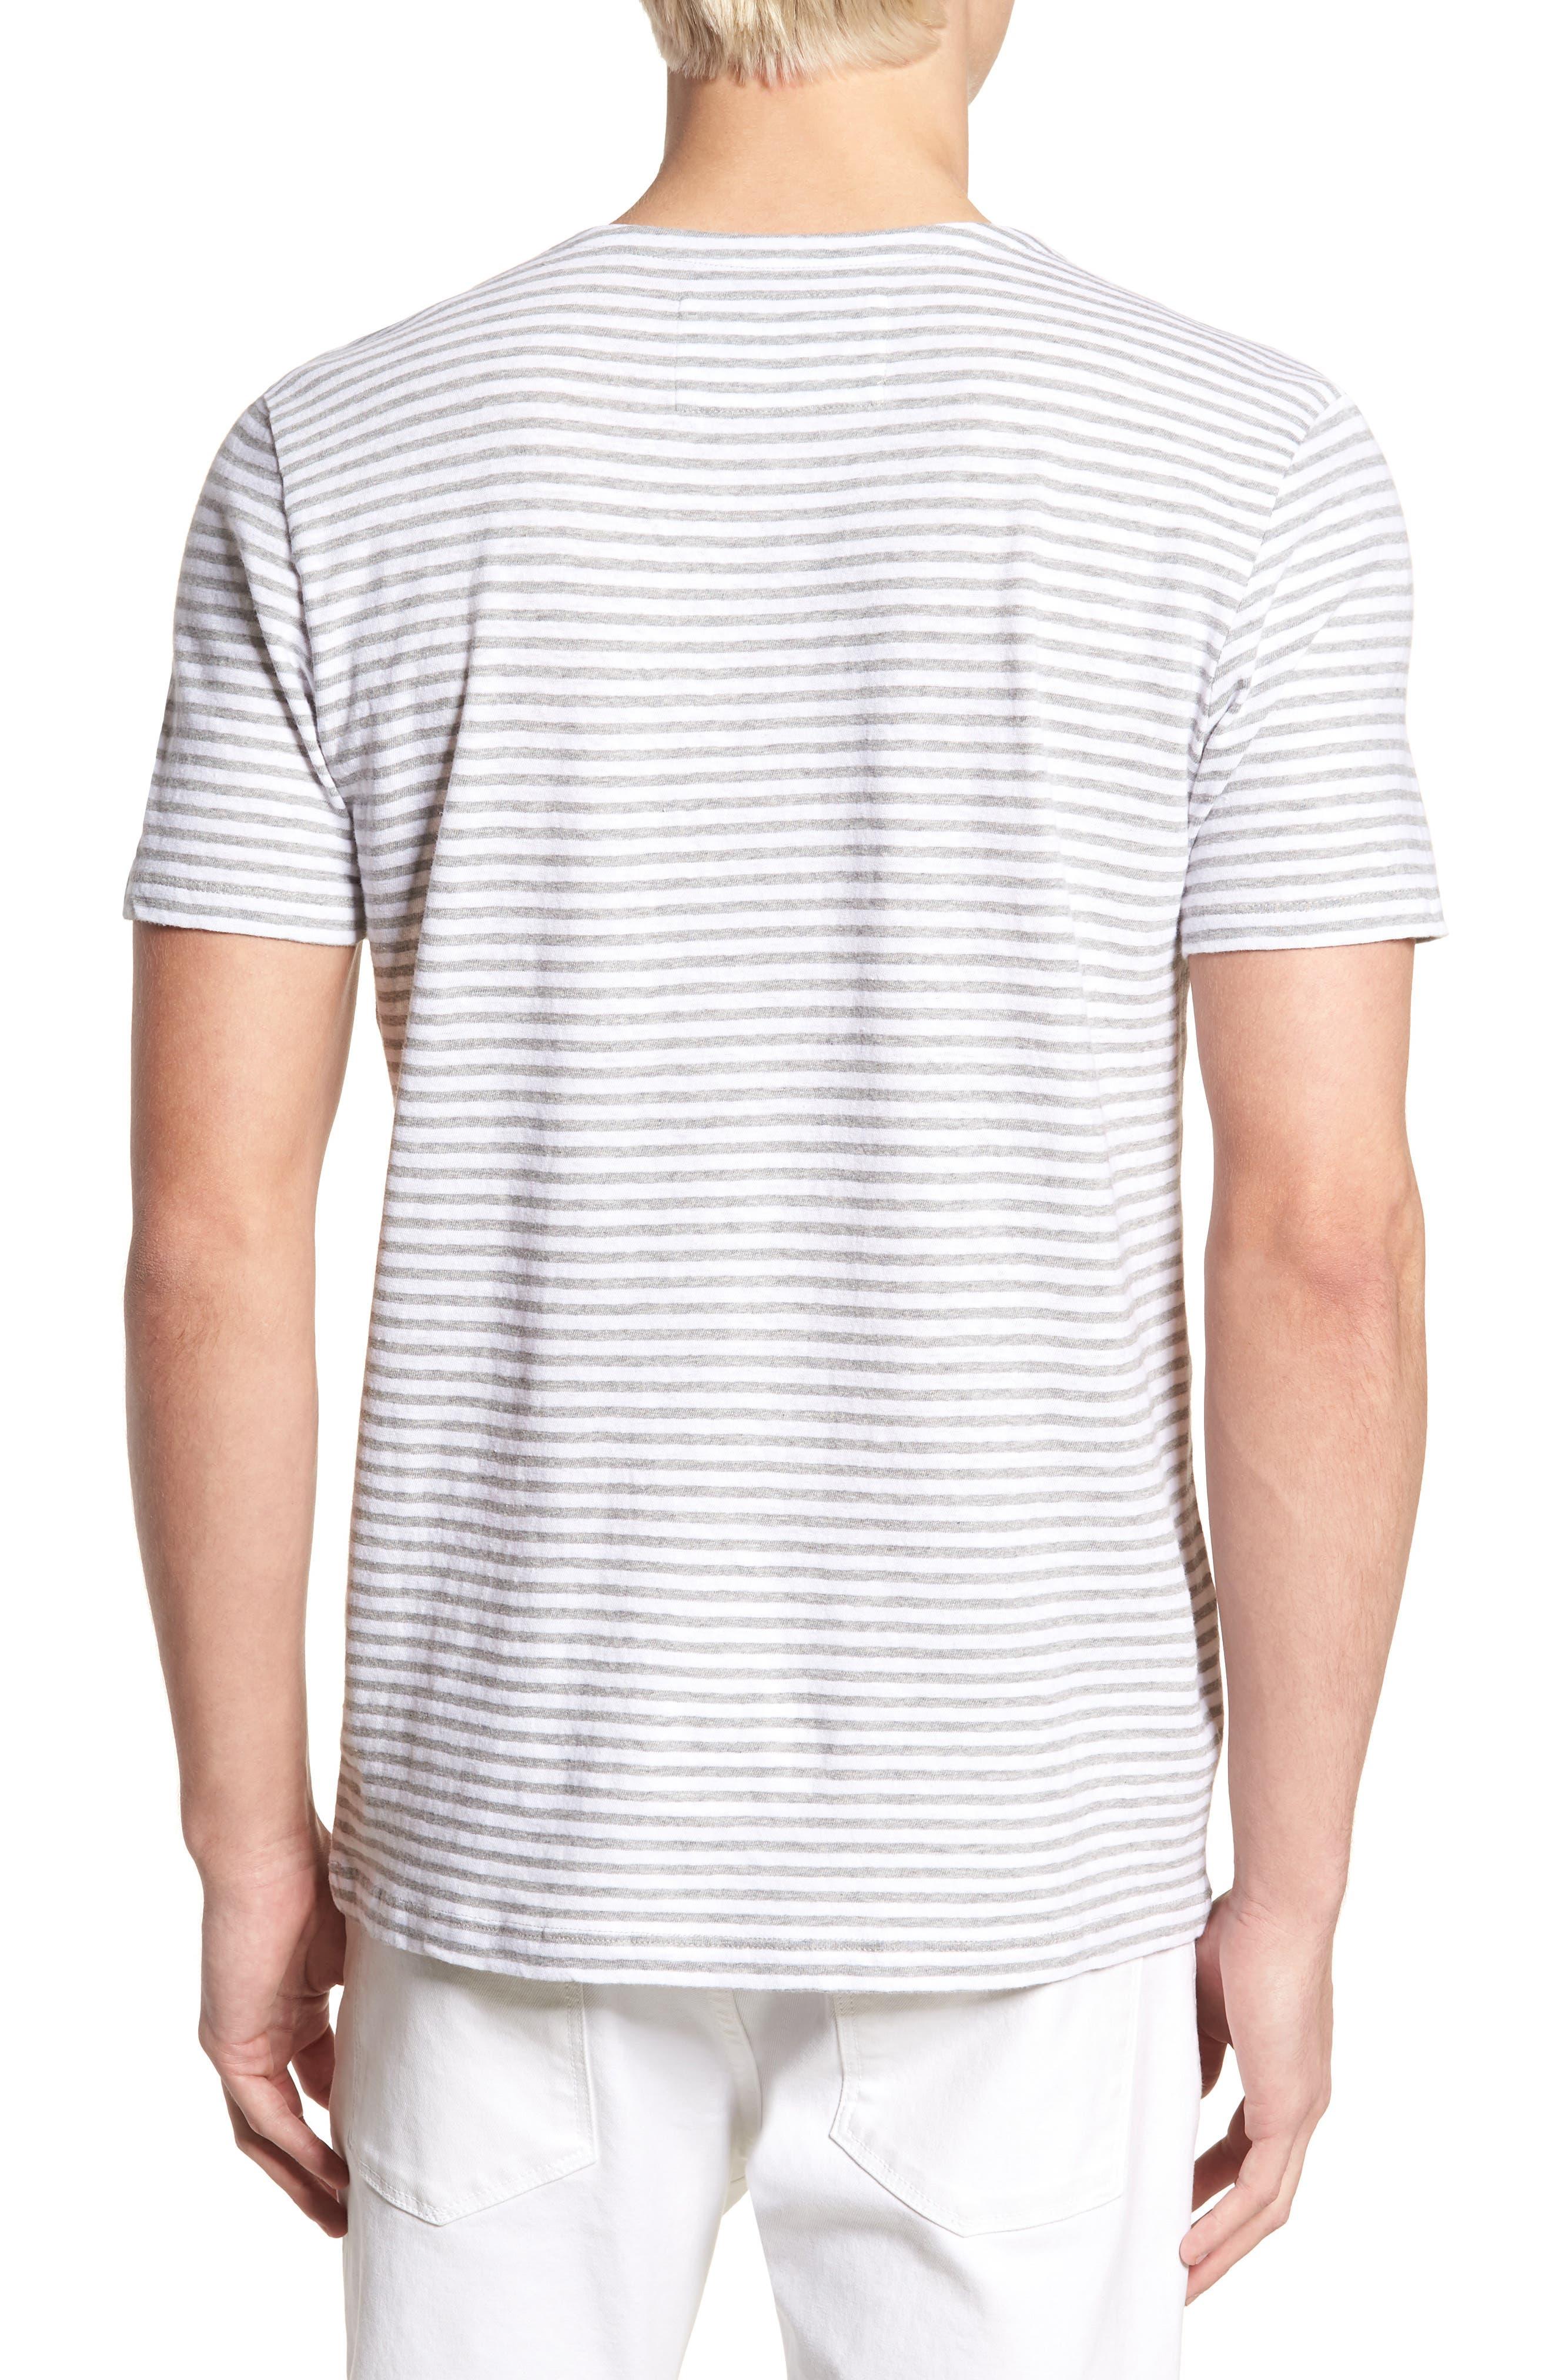 & Bros. Stripe Crewneck T-Shirt,                             Alternate thumbnail 2, color,                             WHITE STRIPE